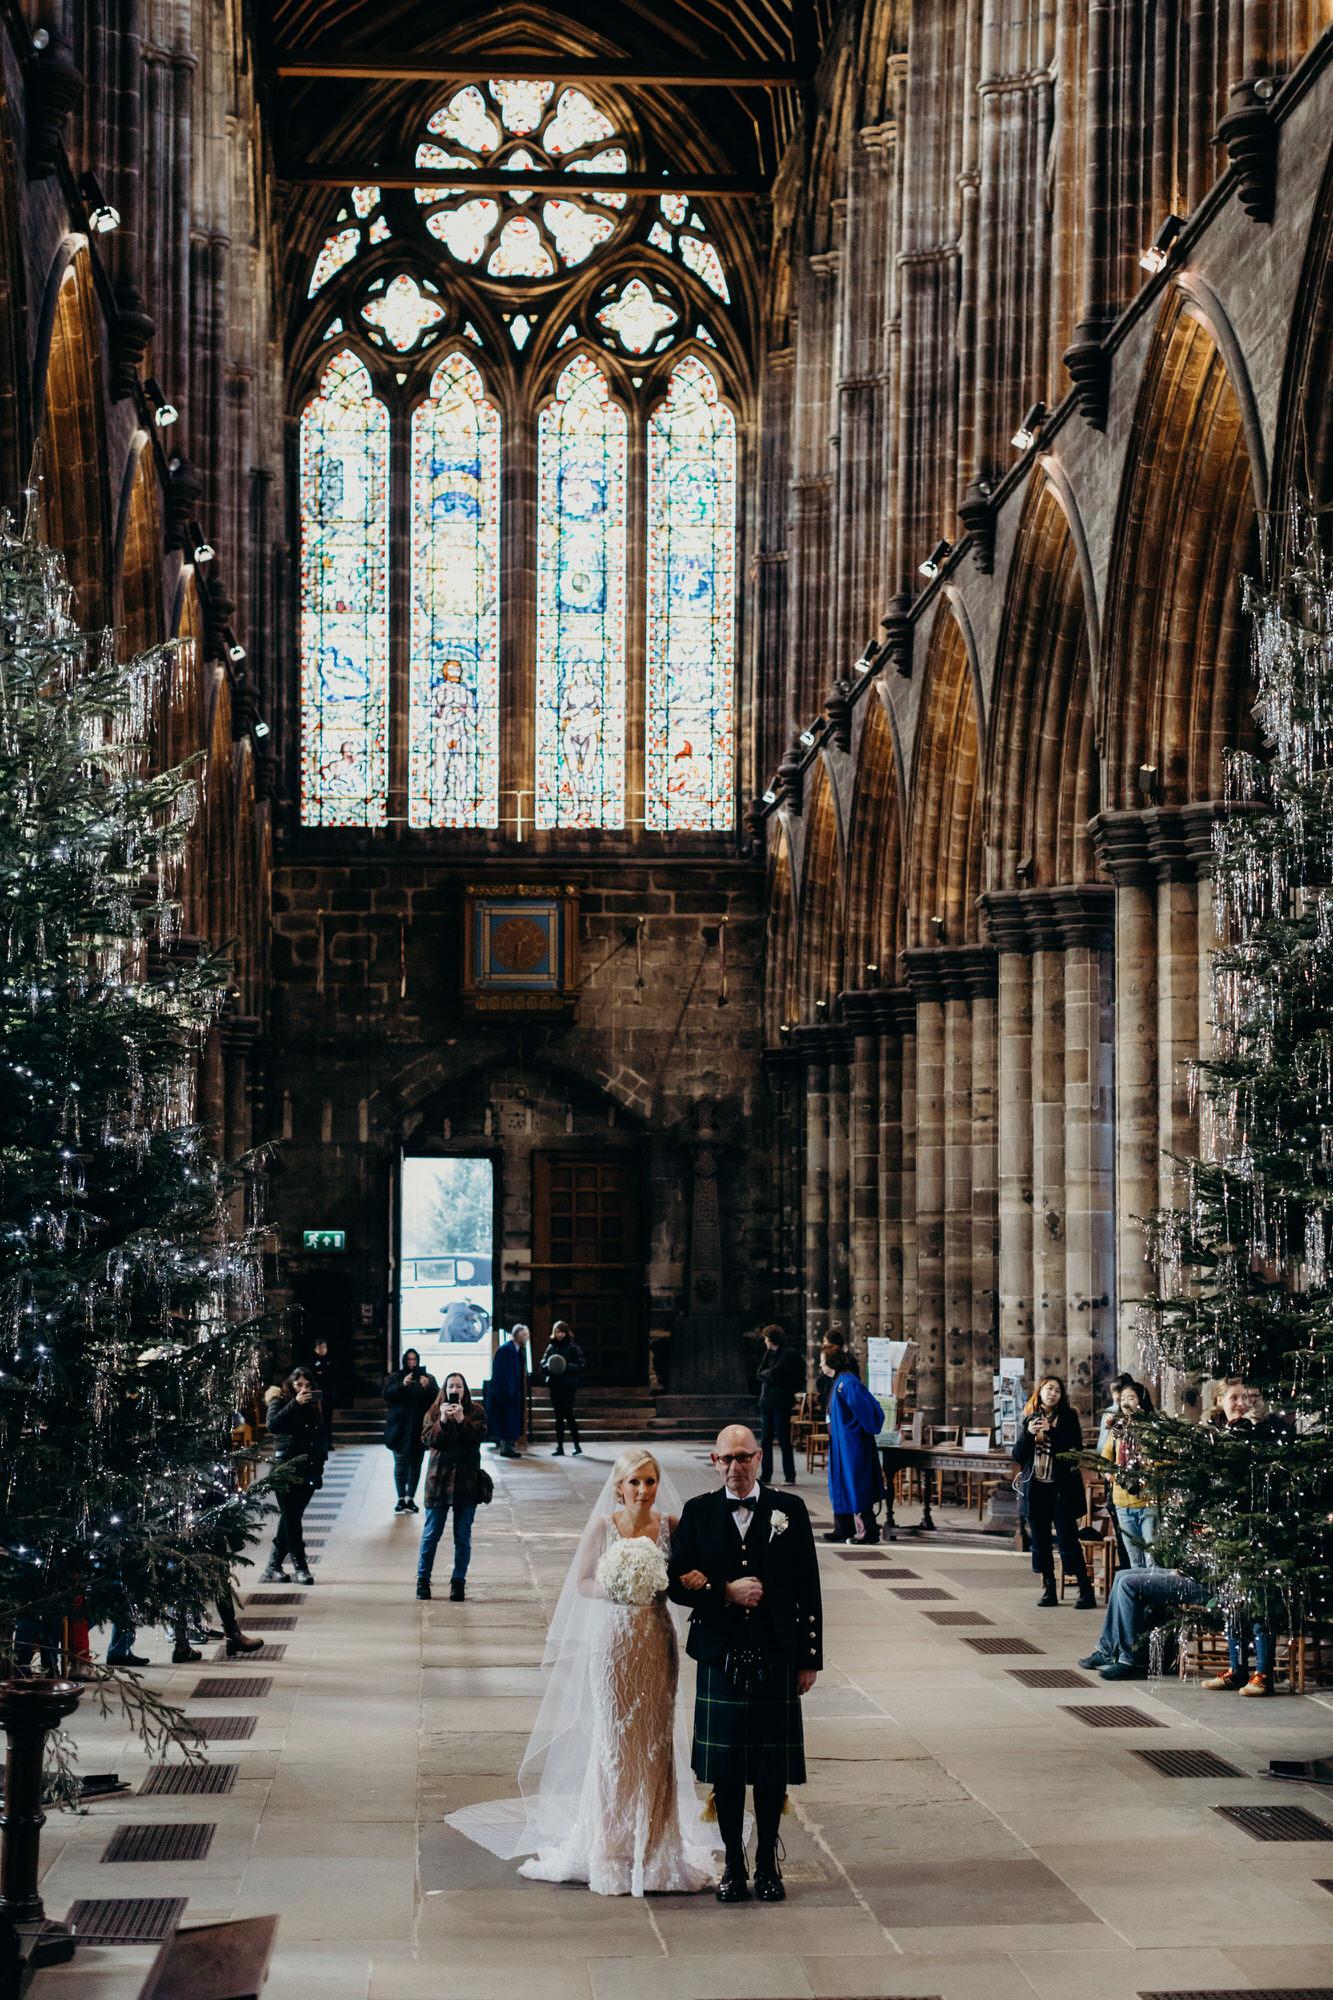 Glasgow Cathedral wedding bride entrance